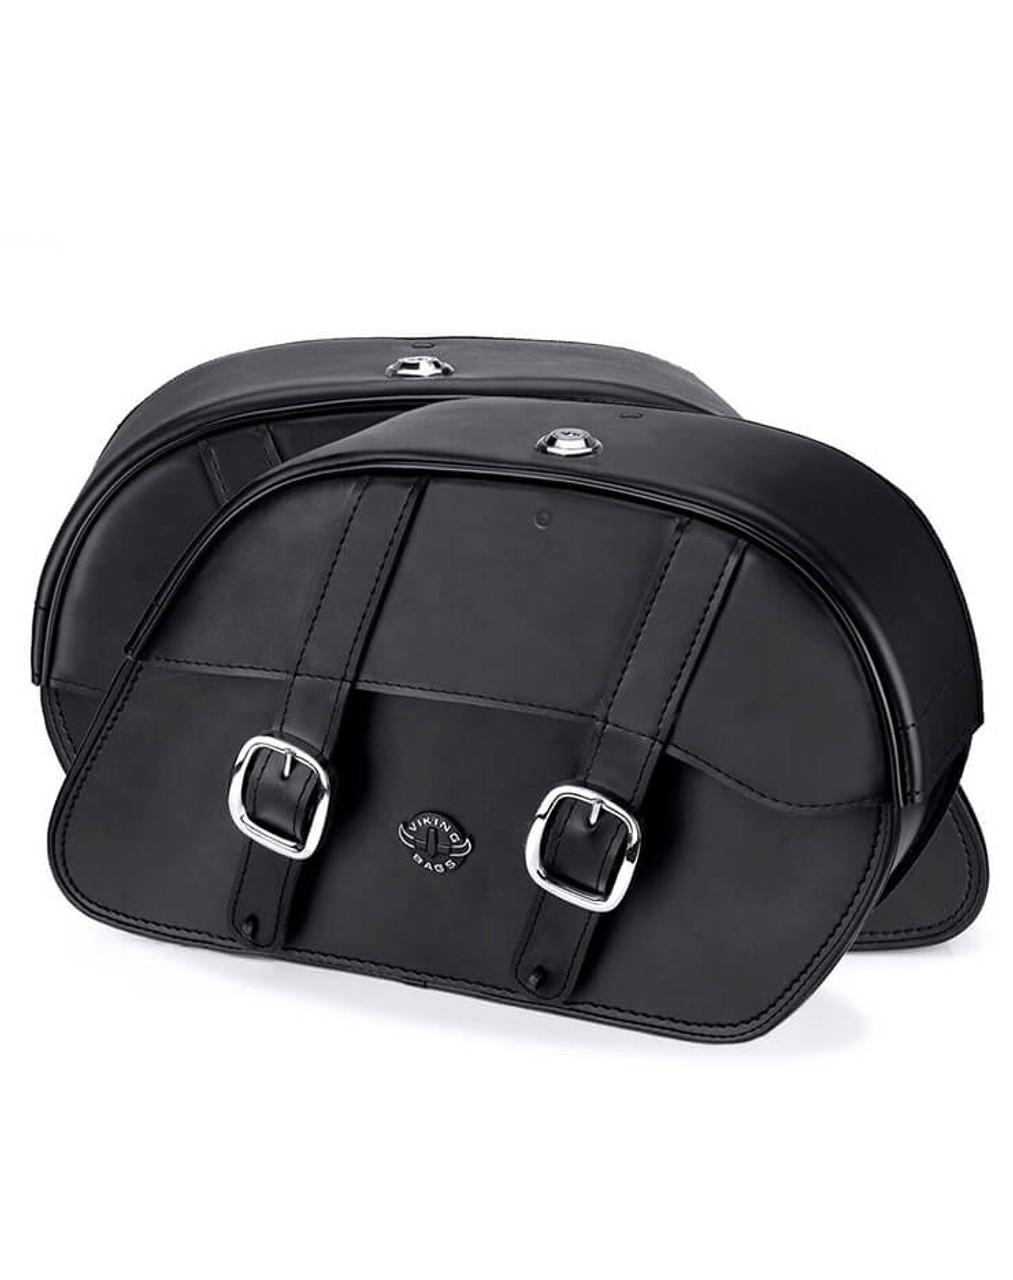 VikingBags Skarner Small Double Strap Honda Shadow Aero ABS VT750CS Leather Motorcycle Saddlebags both bags view